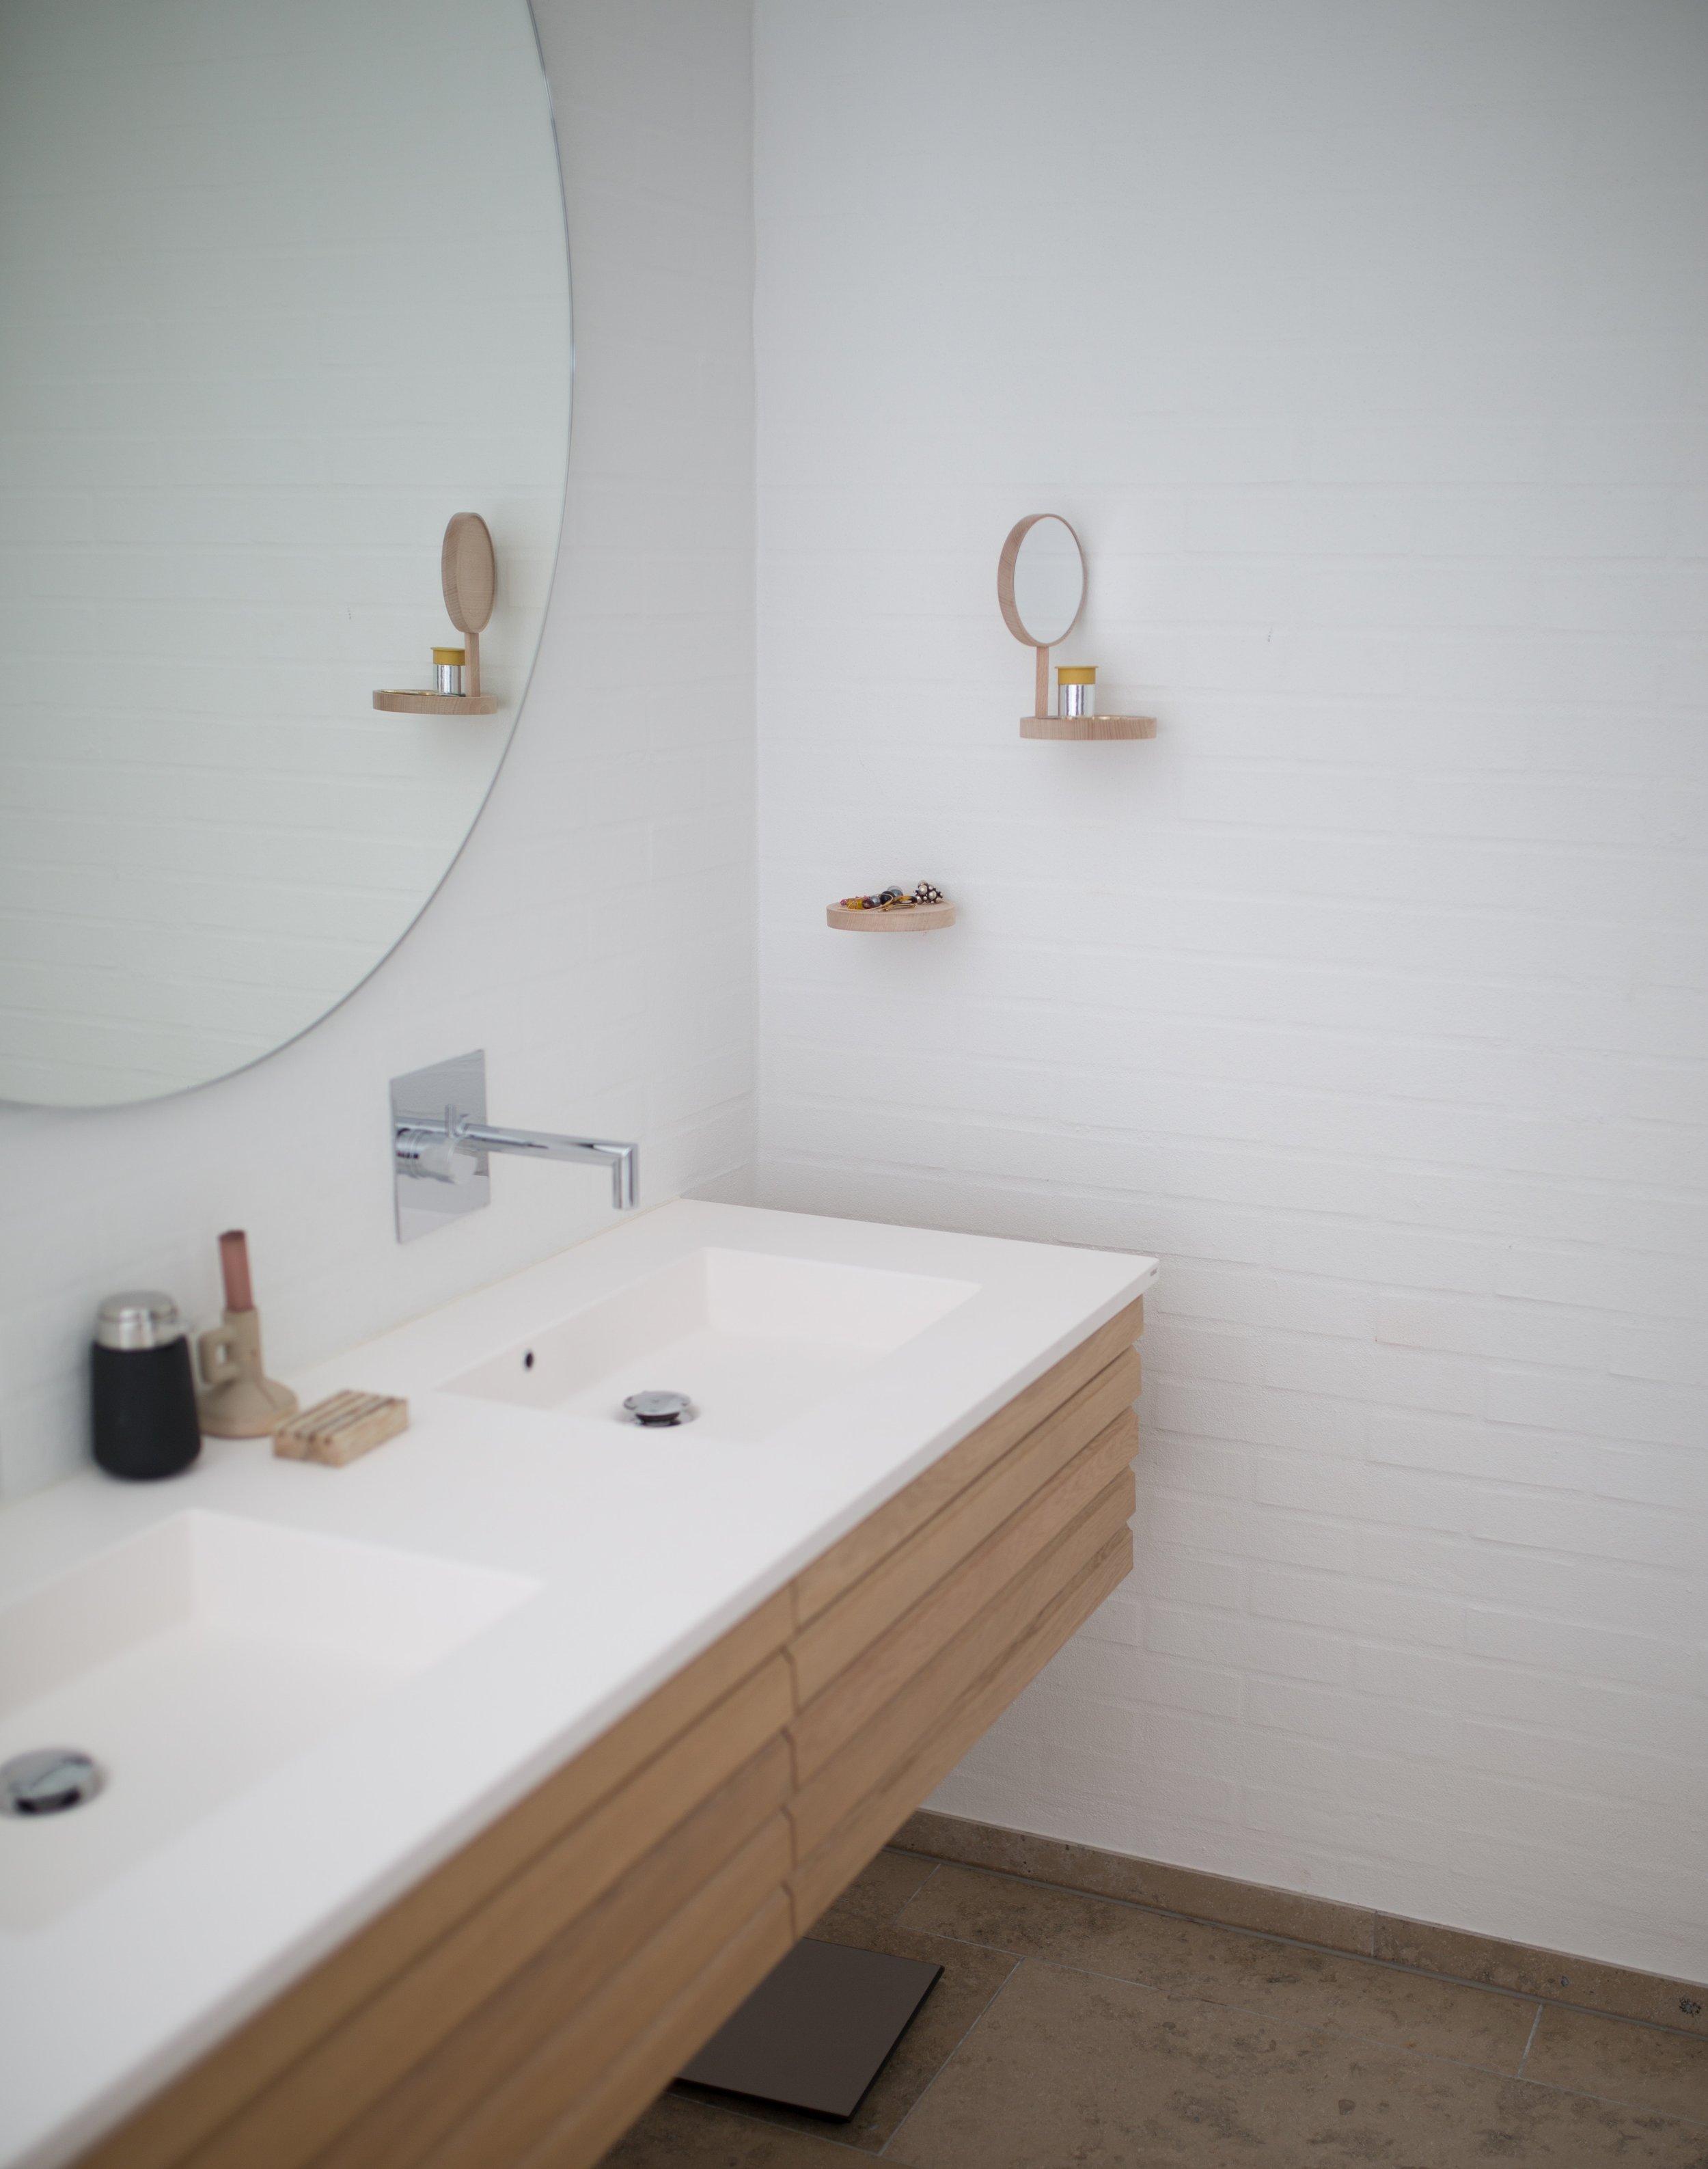 bathroom-faucet-indoors-1358910.jpg